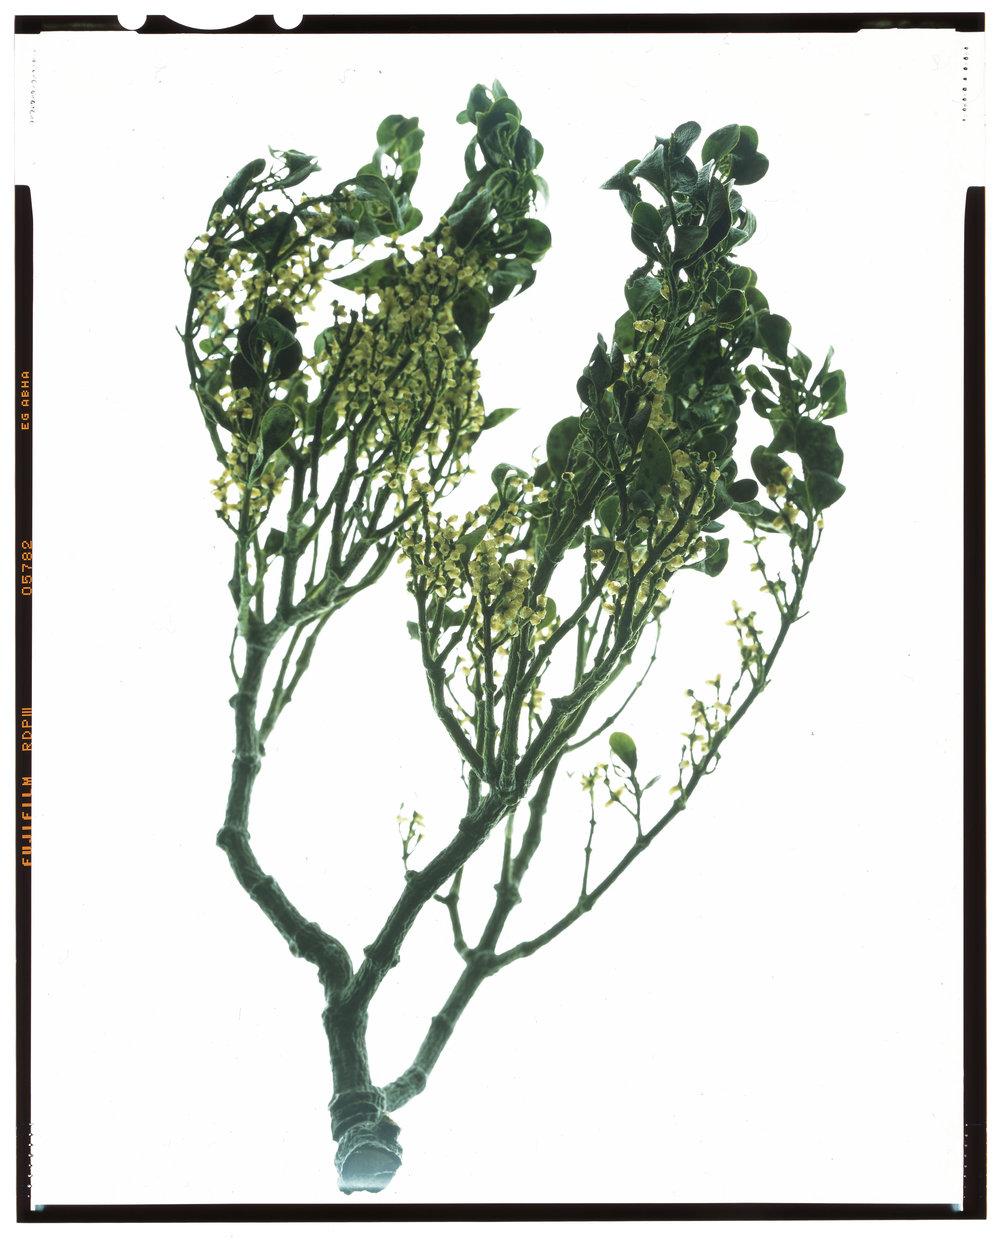 Phoradendron leucarpum, American mistletoe